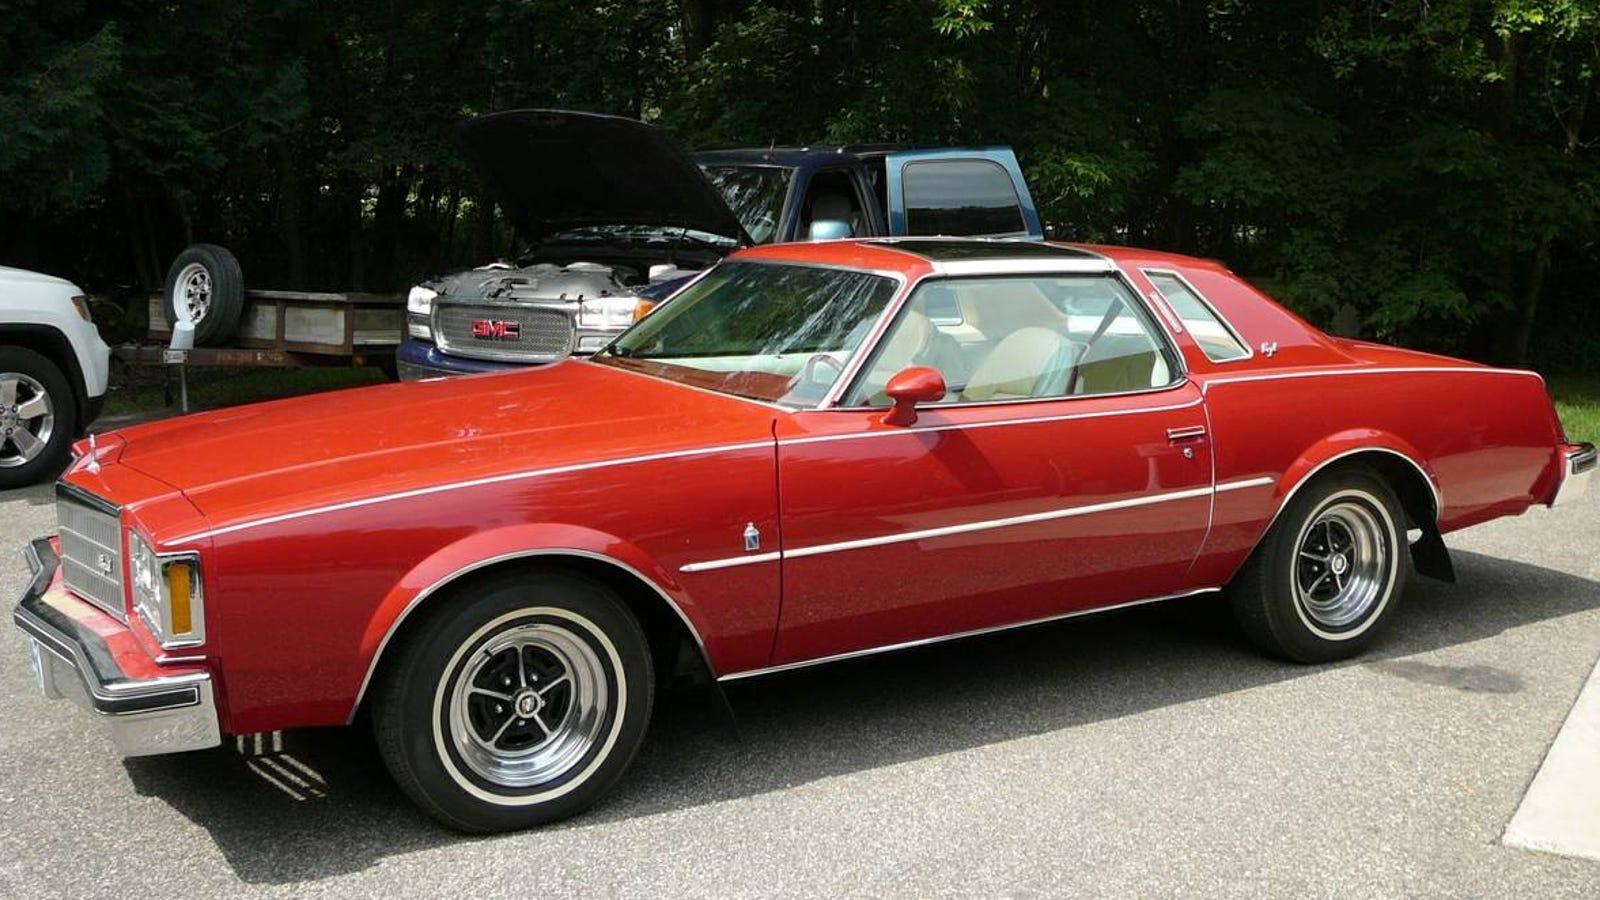 sale car cadillac michigan classics cars near buick for regal classic american